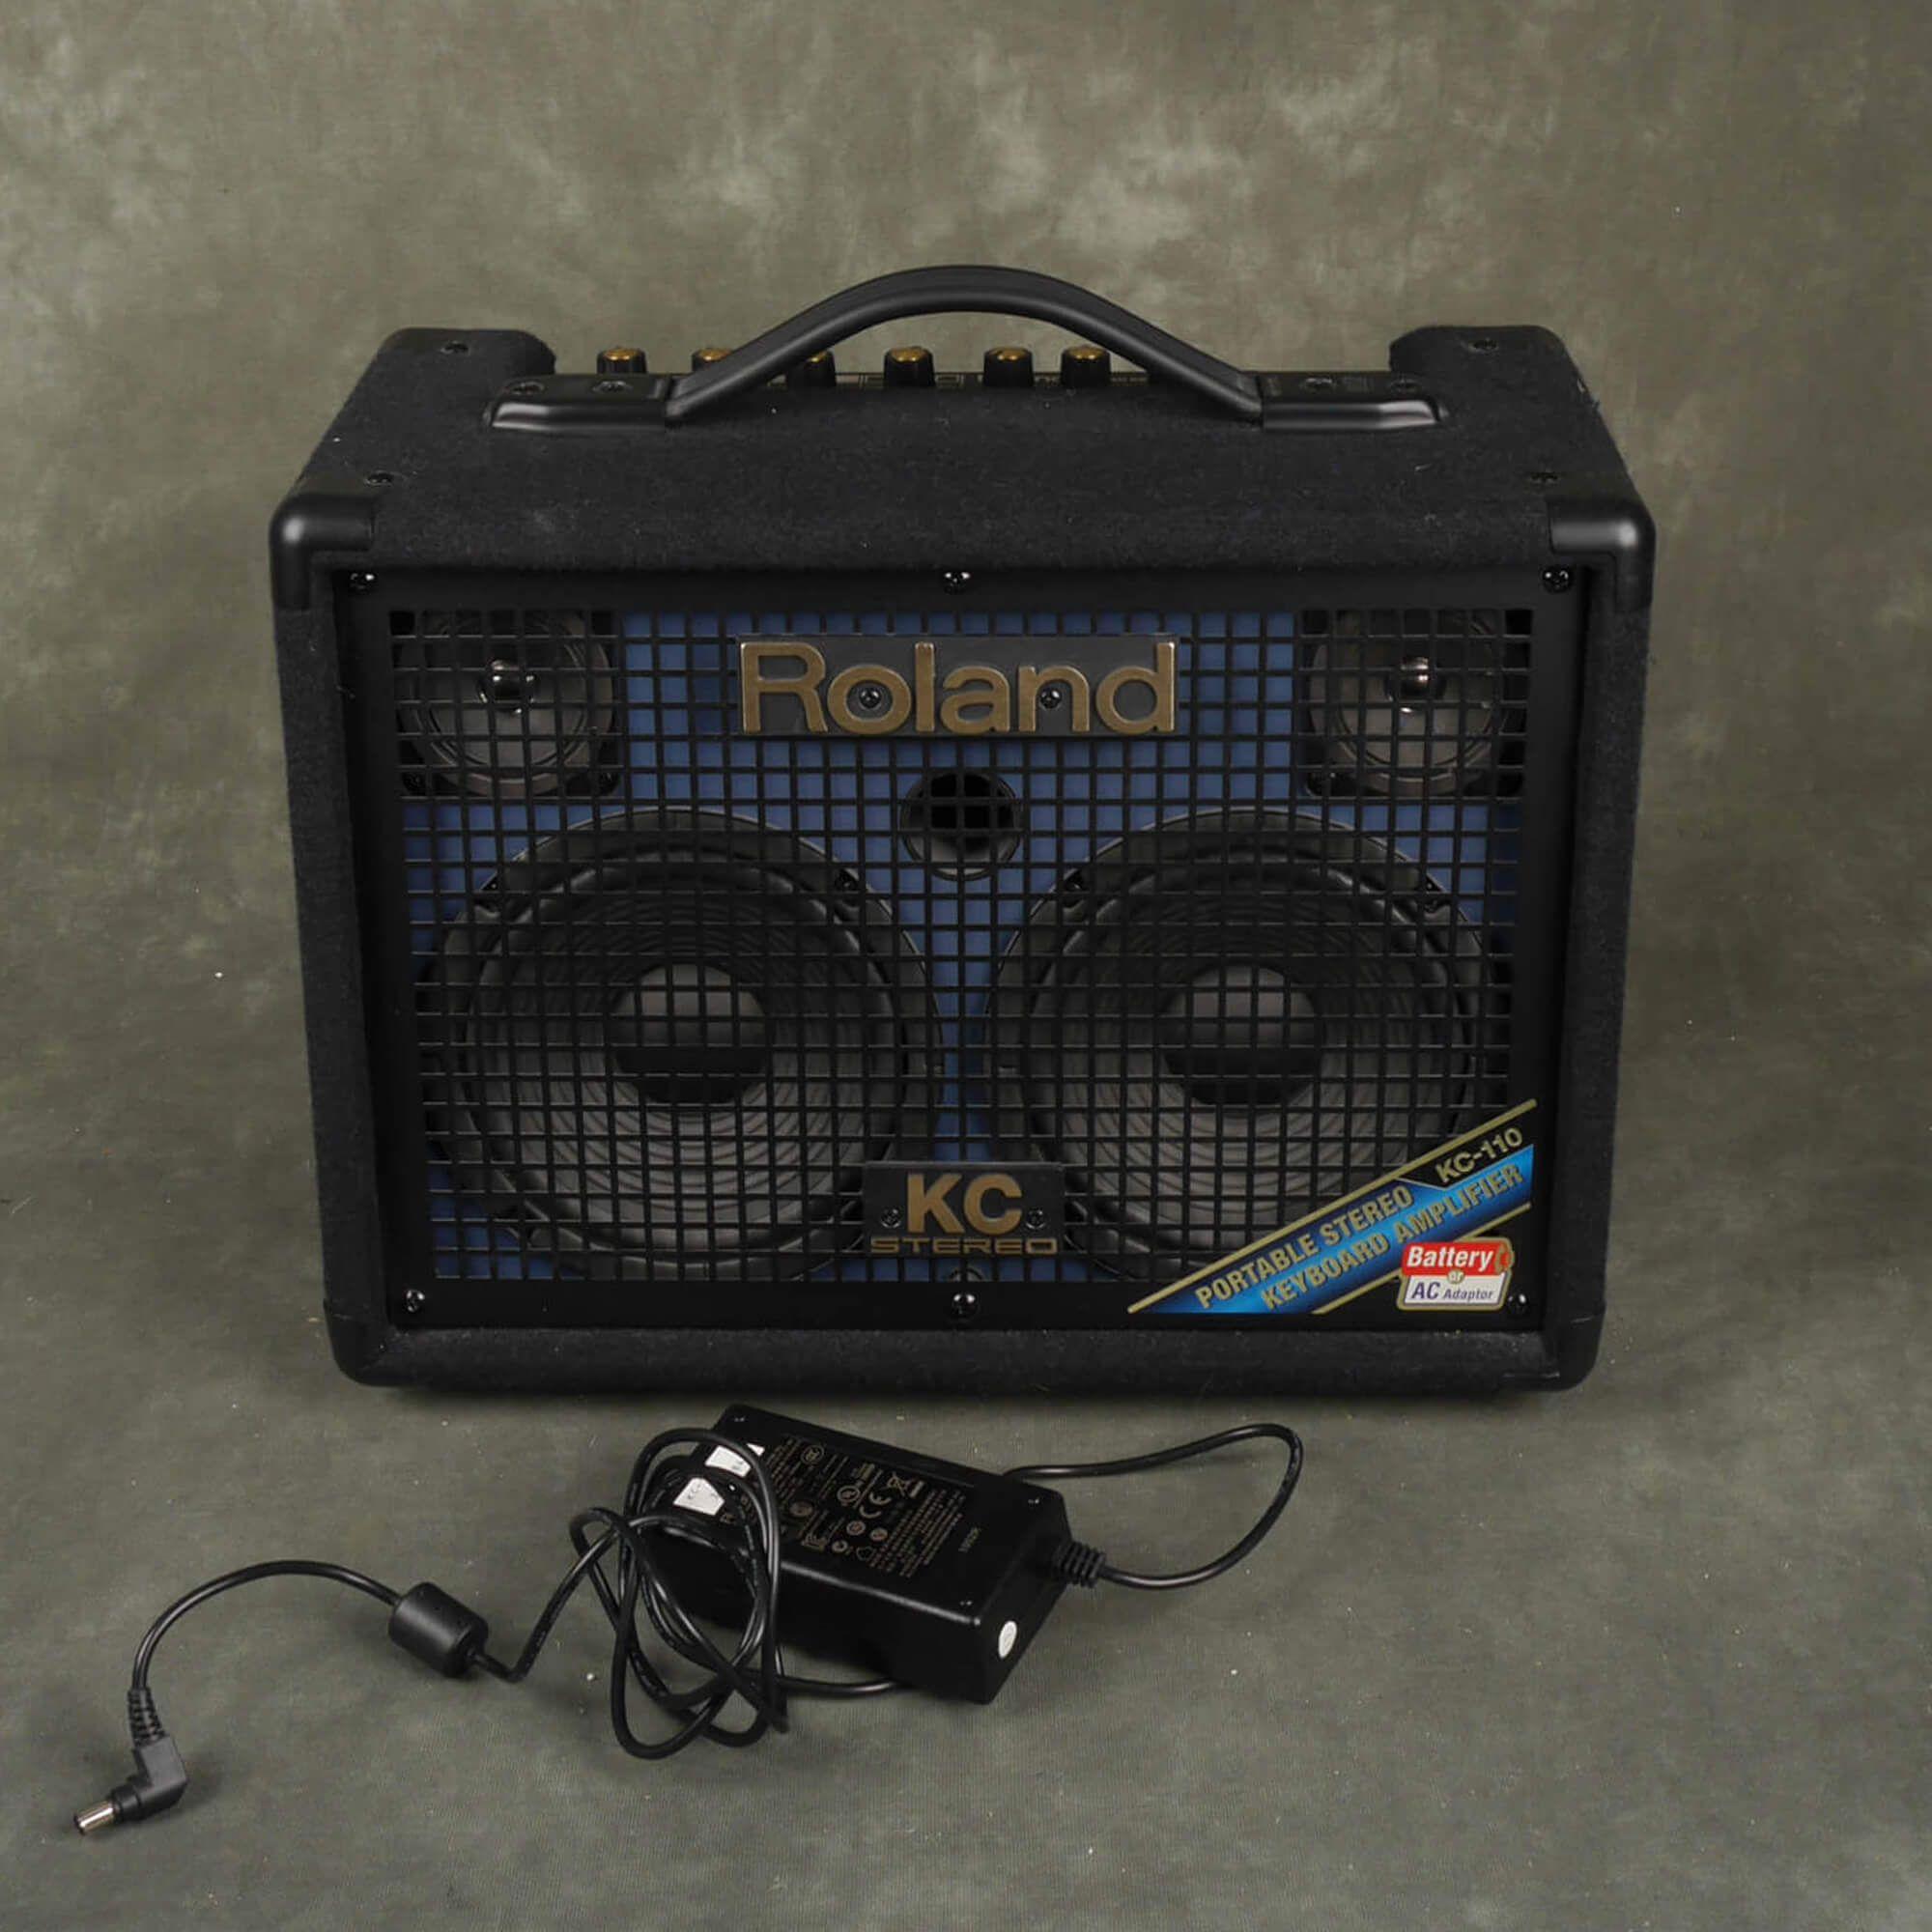 Roland KC-100 Keyboard Amplifier - 2nd Hand